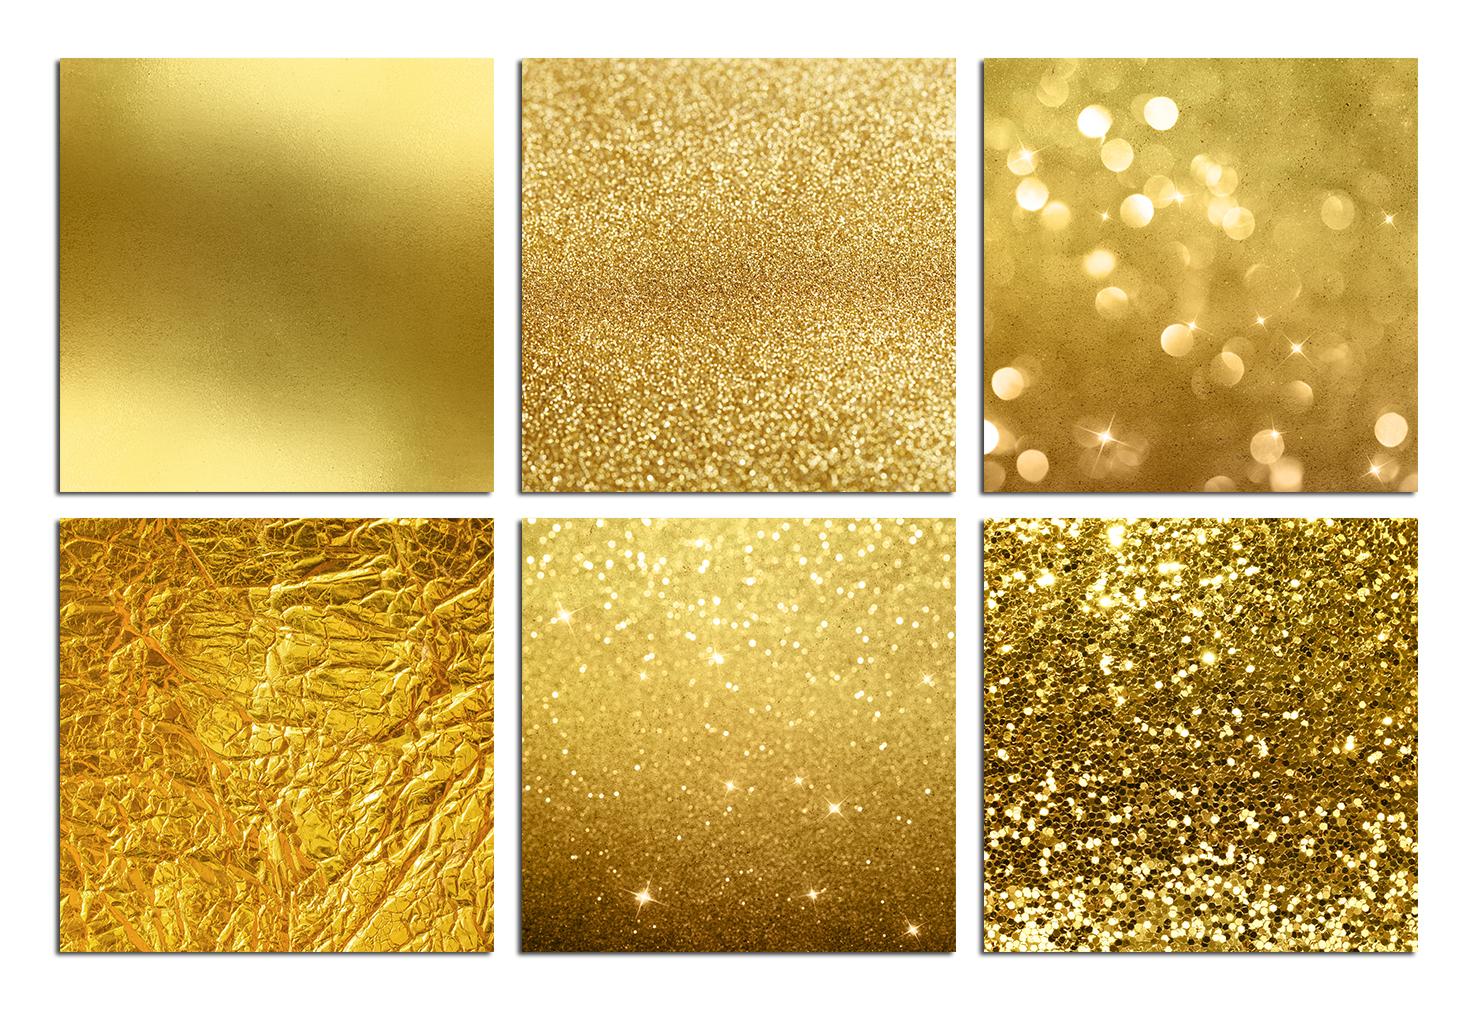 Gold Foil & Glitter Digital Paper example image 3